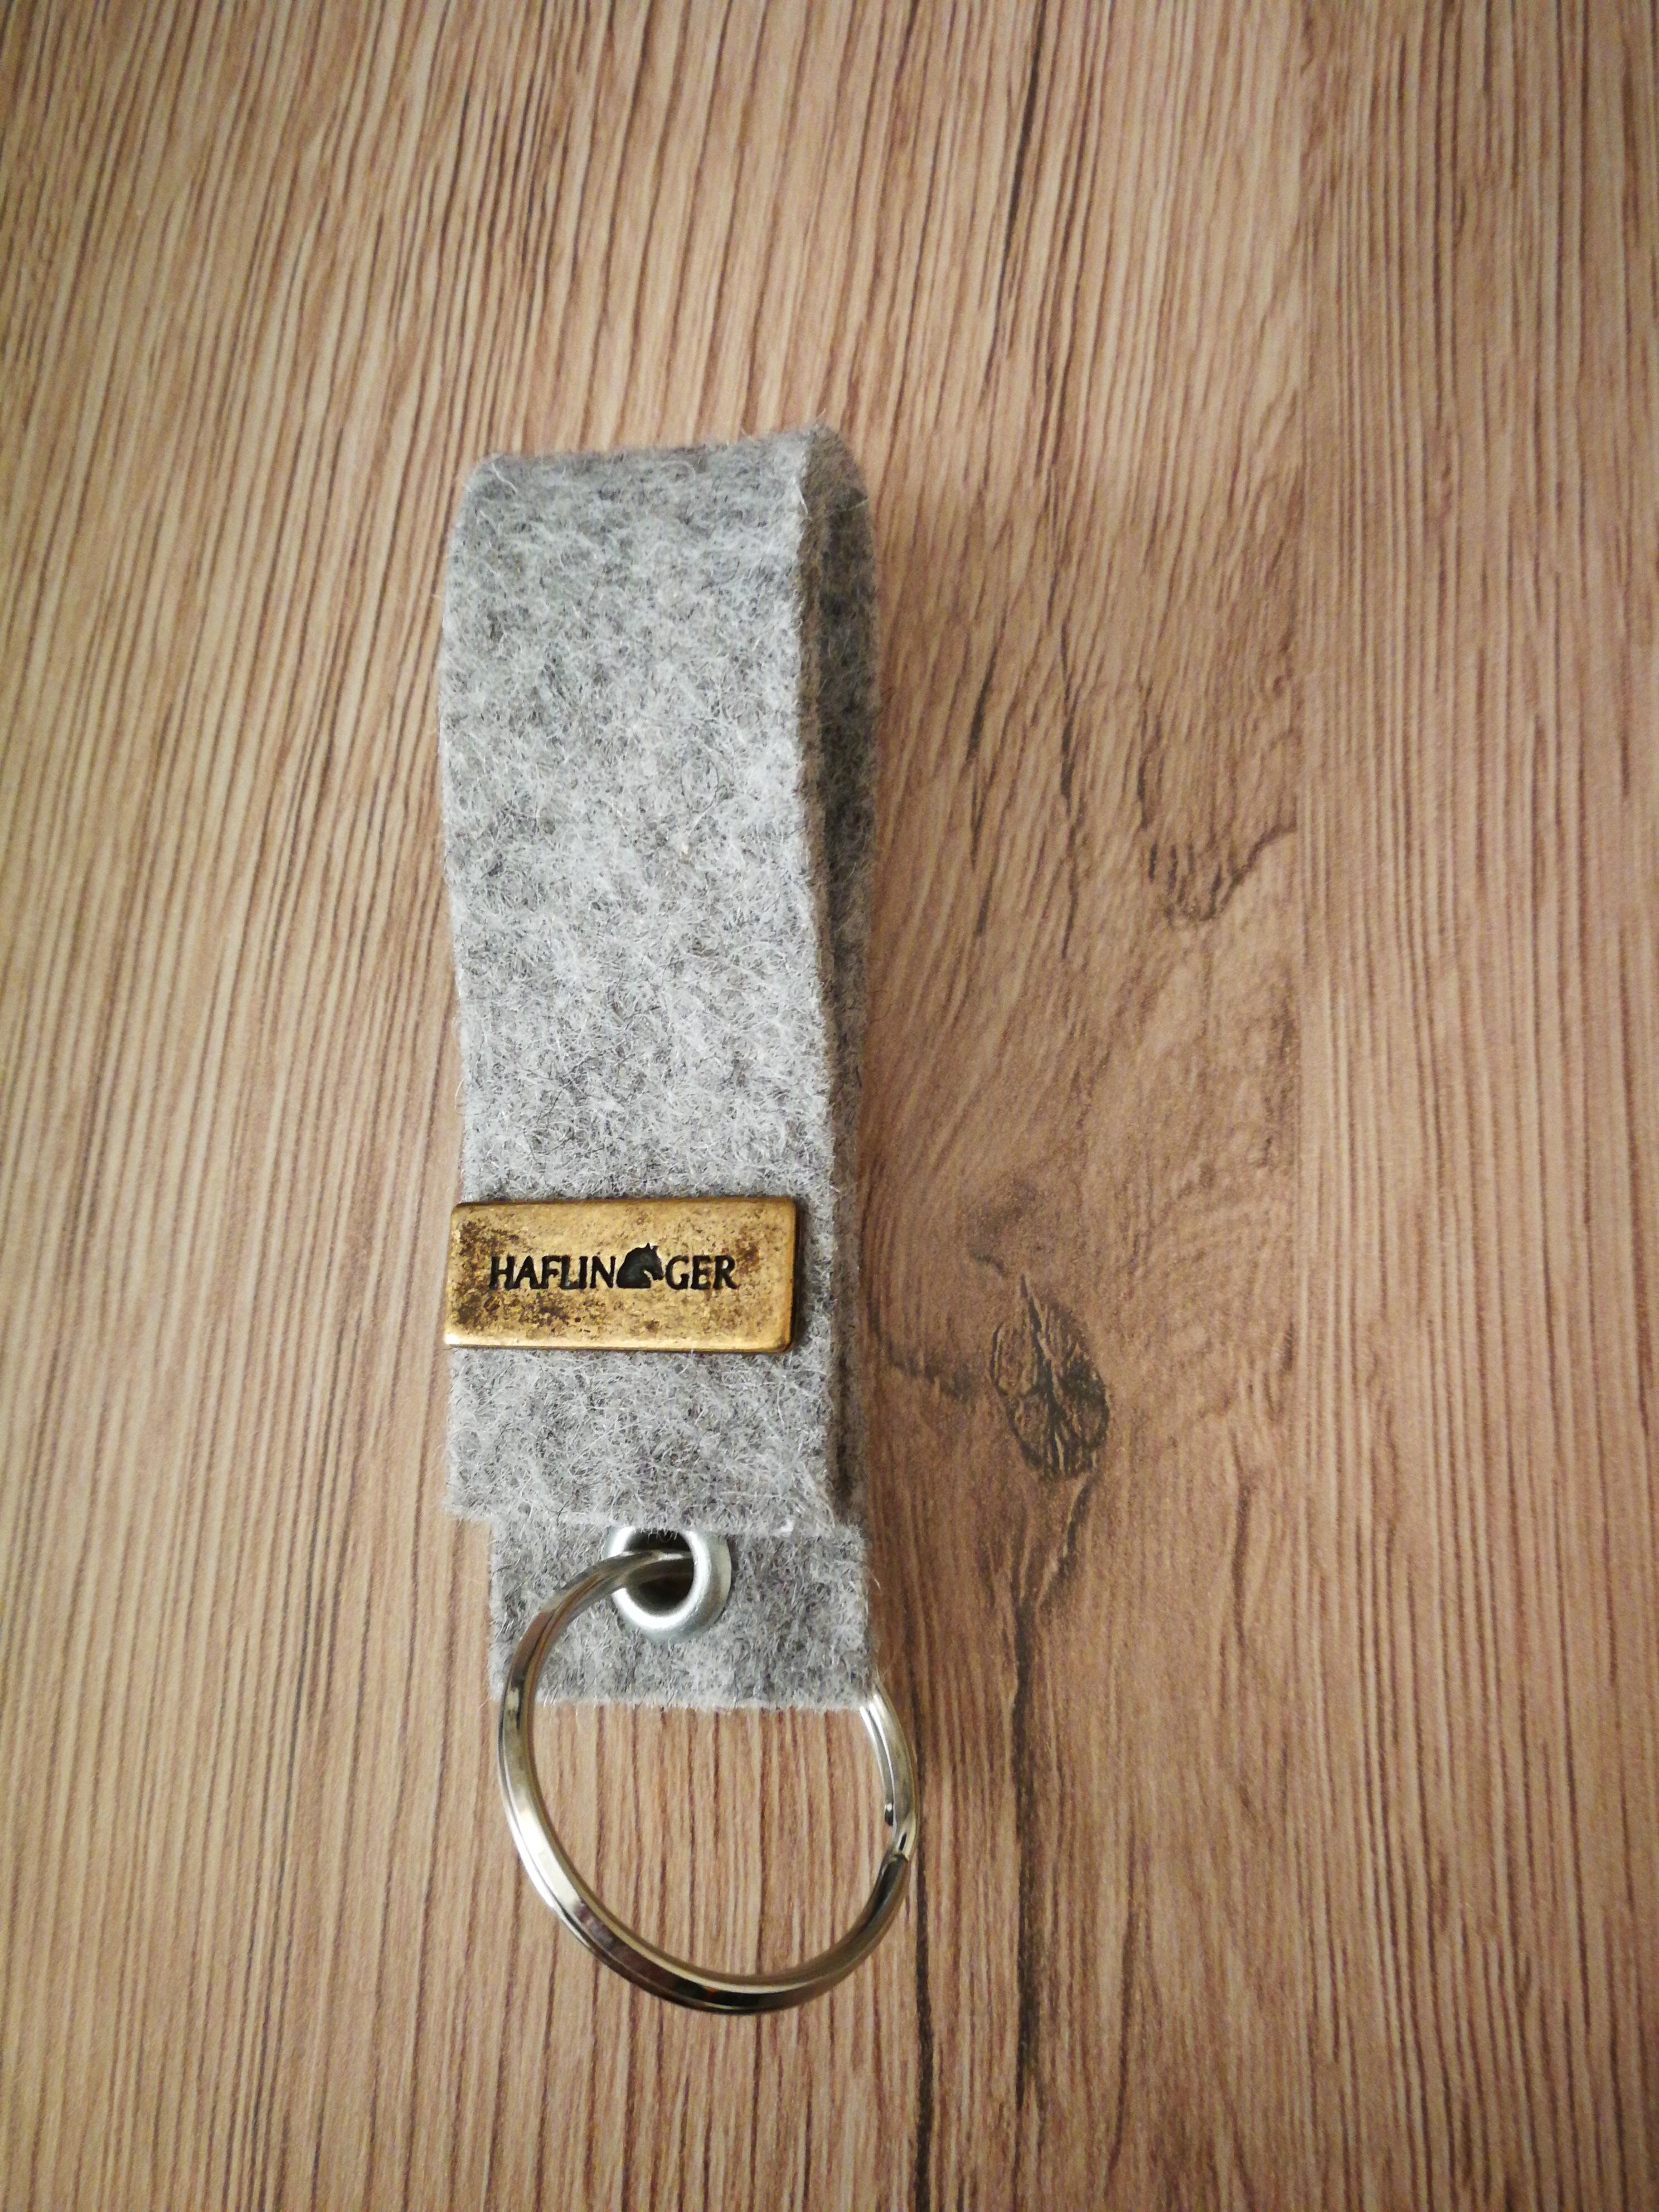 Hafflinger Schlüsselanhänger  tauschen